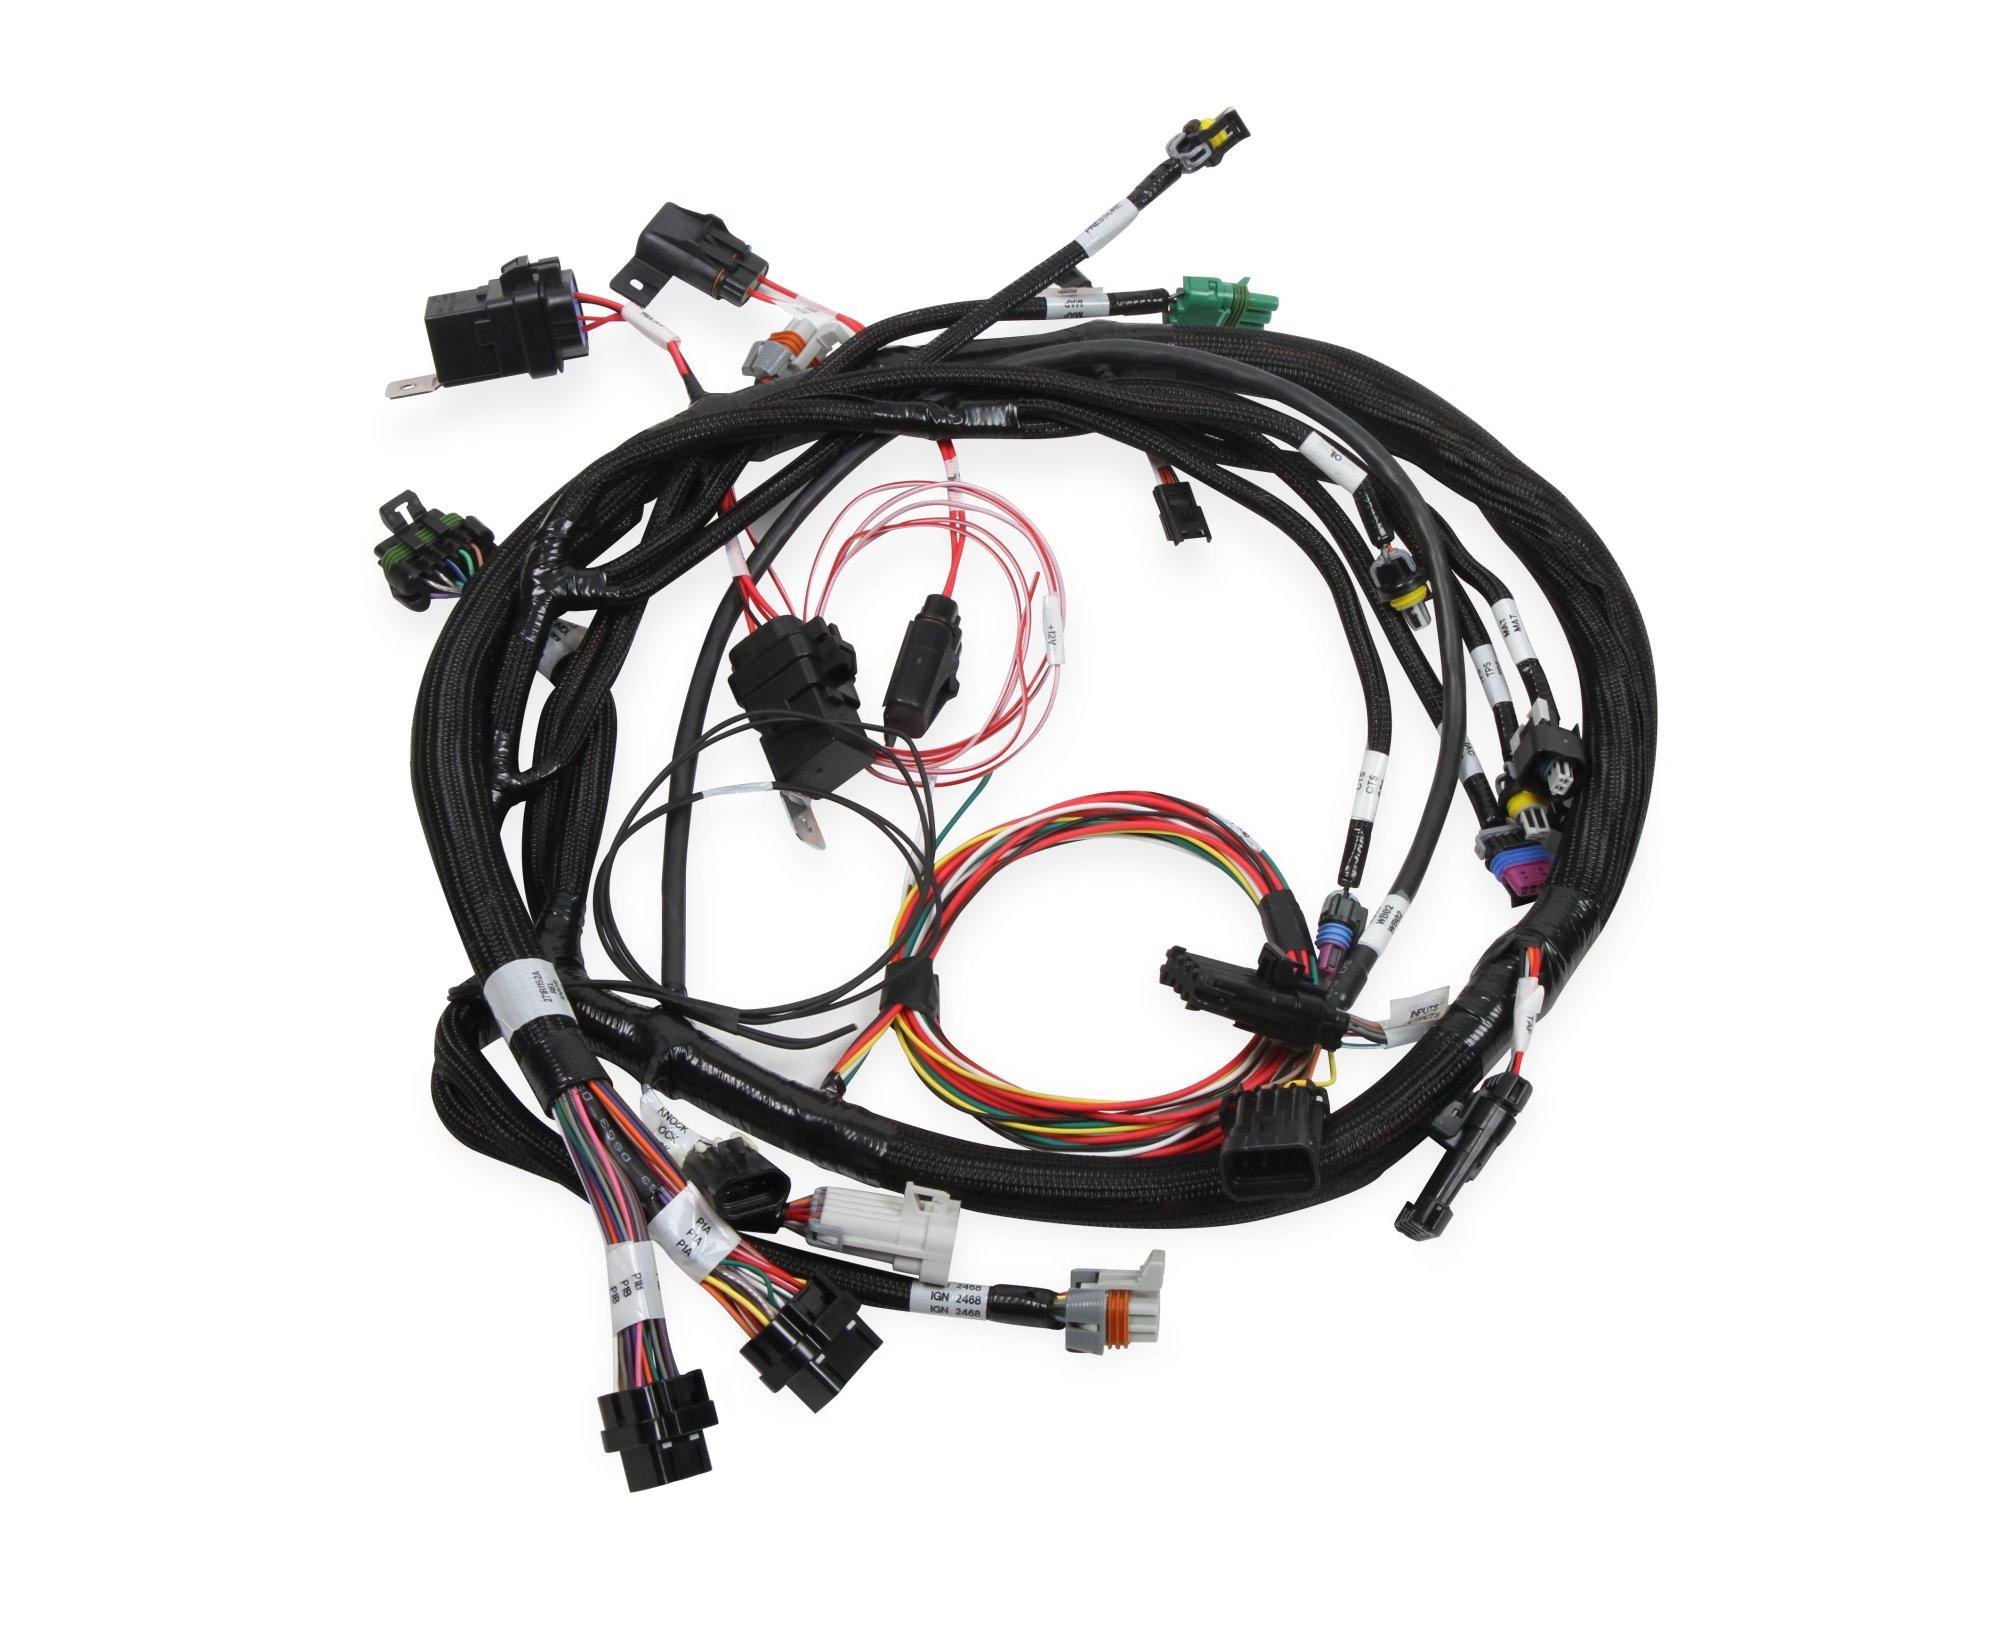 hight resolution of 558 117 universal mpfi coil on plug main harness image